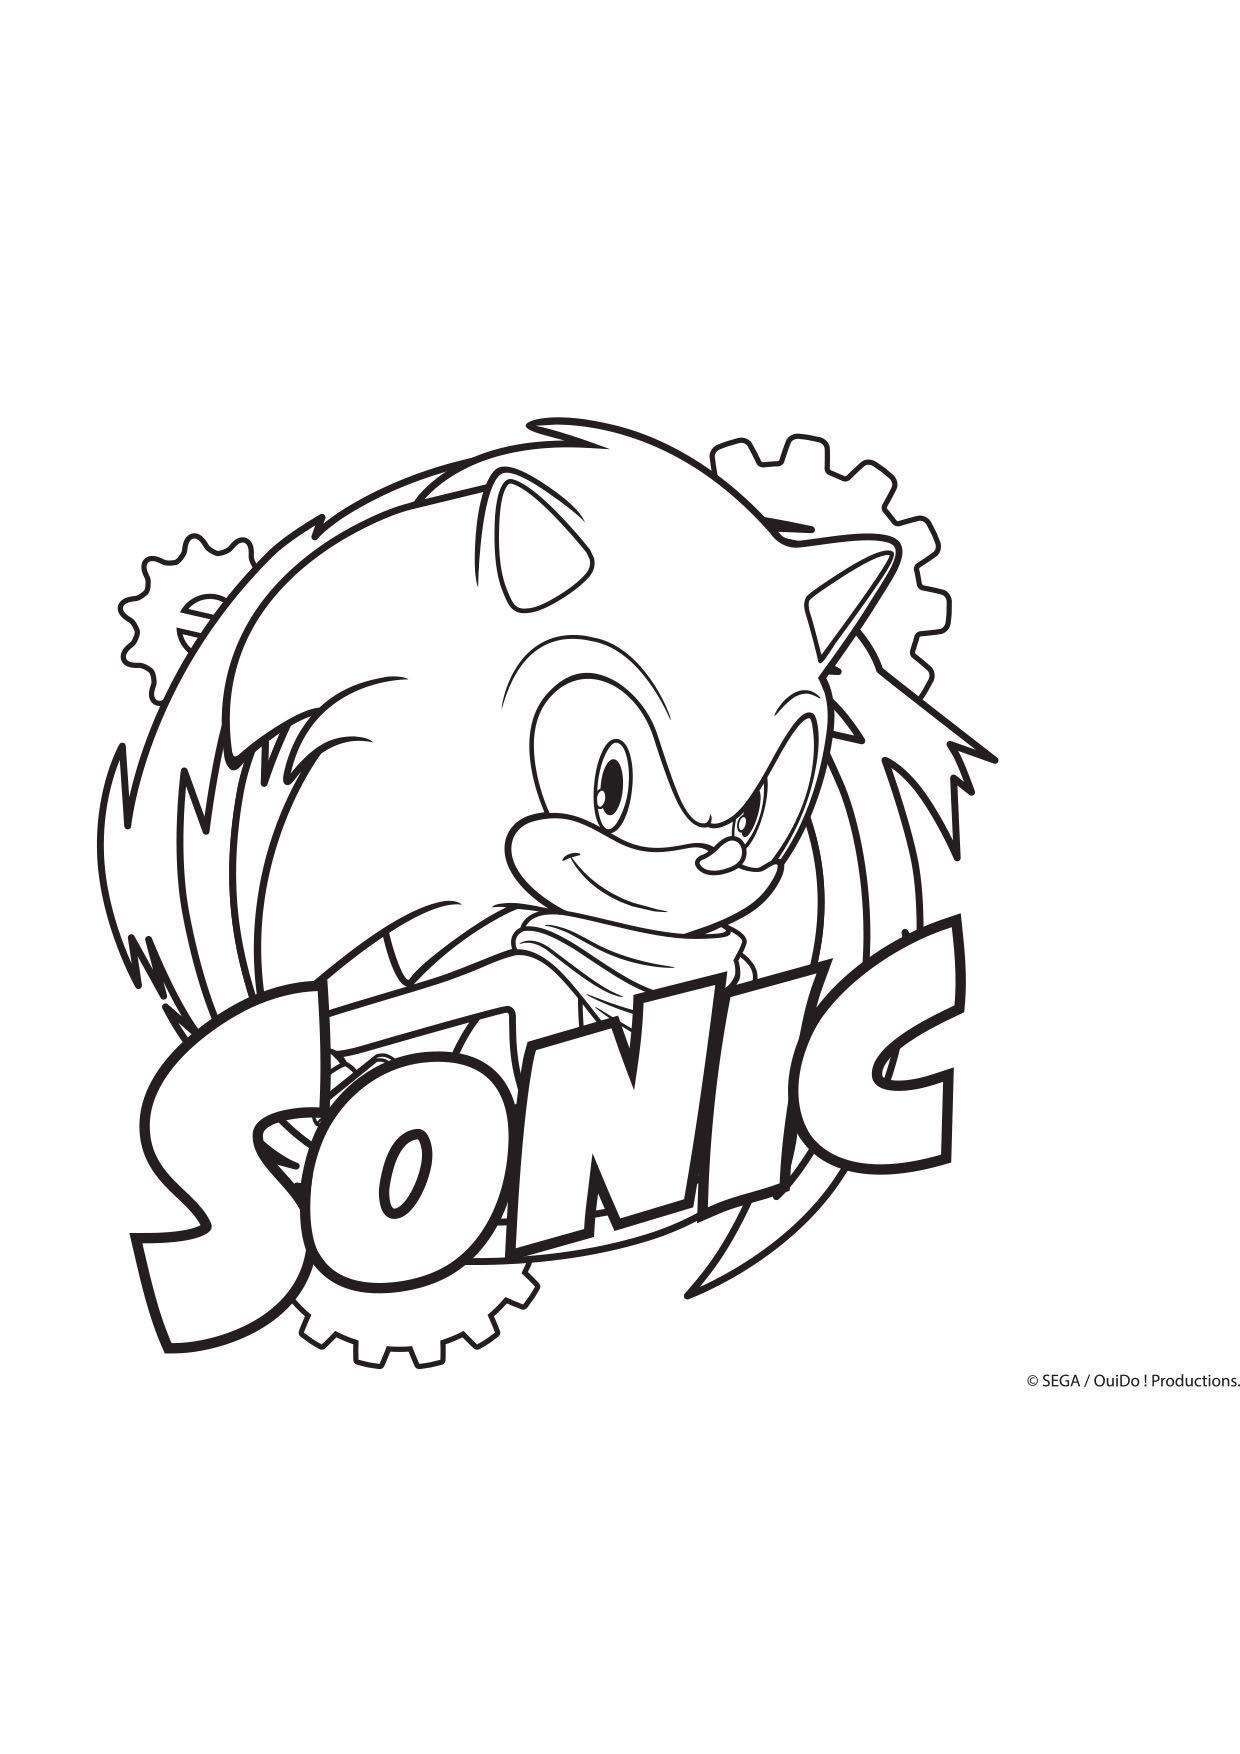 Coloriage Sonic Coloriage Sonic Boom Coloriages Dessins Animes